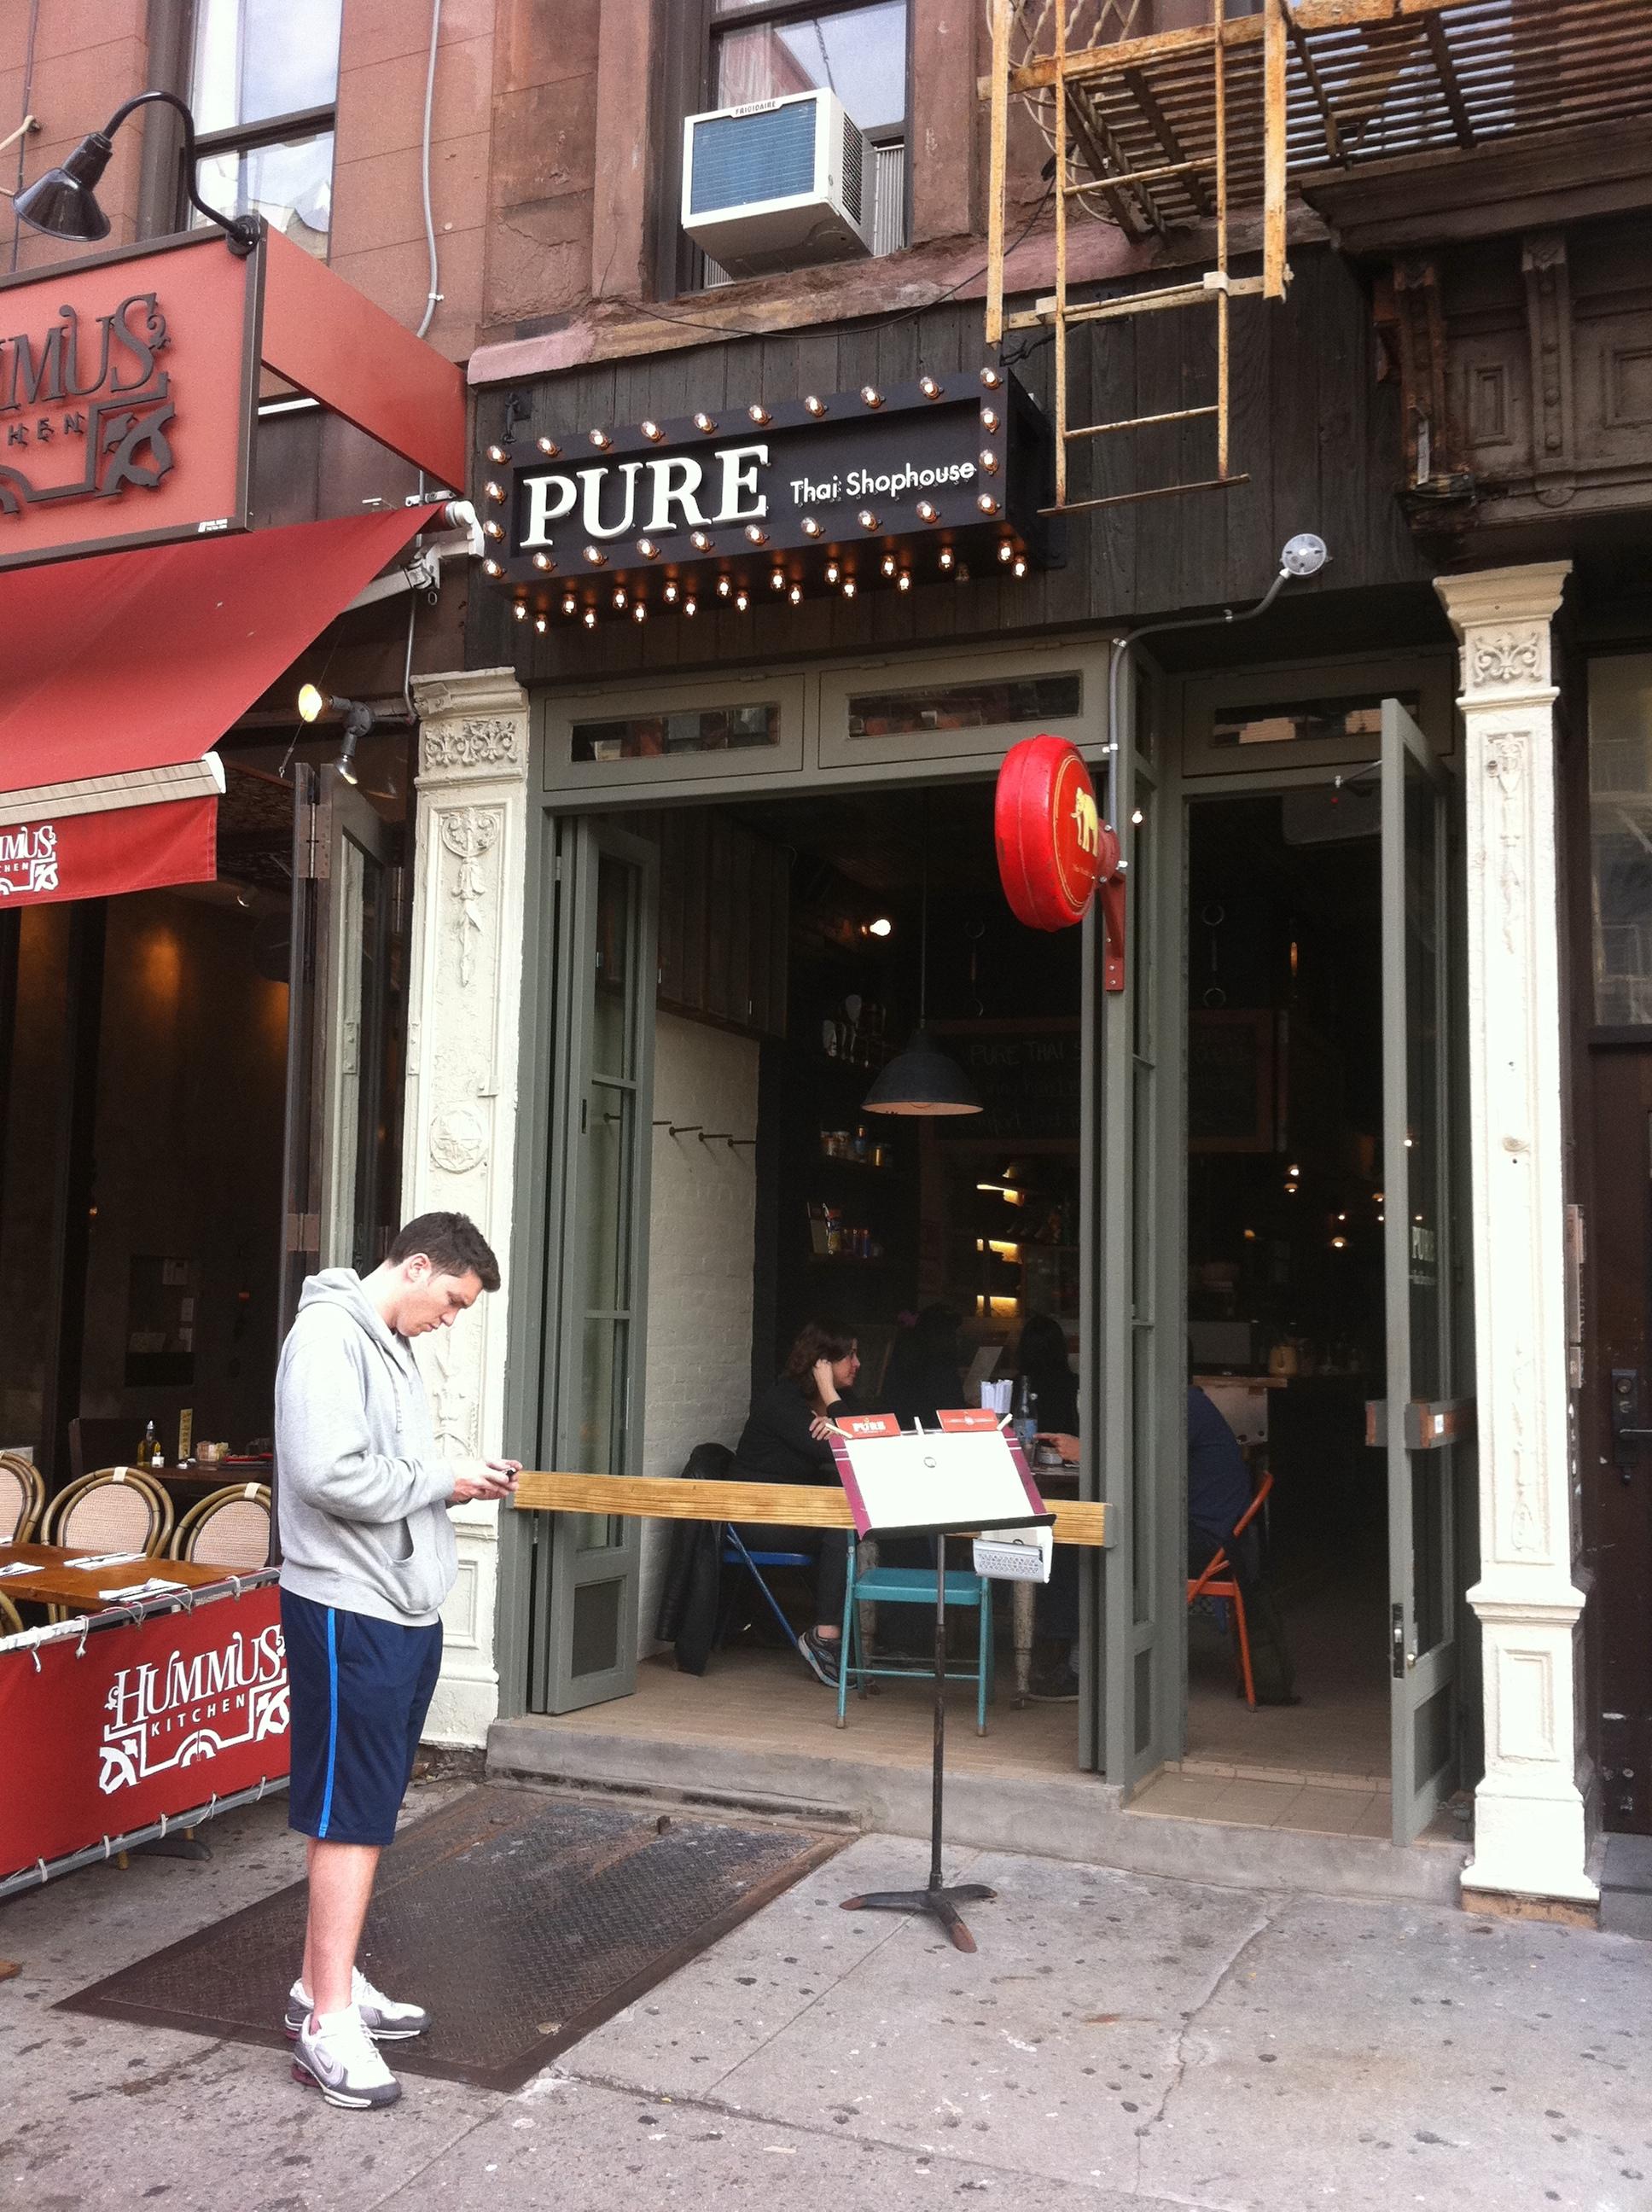 Pure Thai Shophouse Me Like Eat